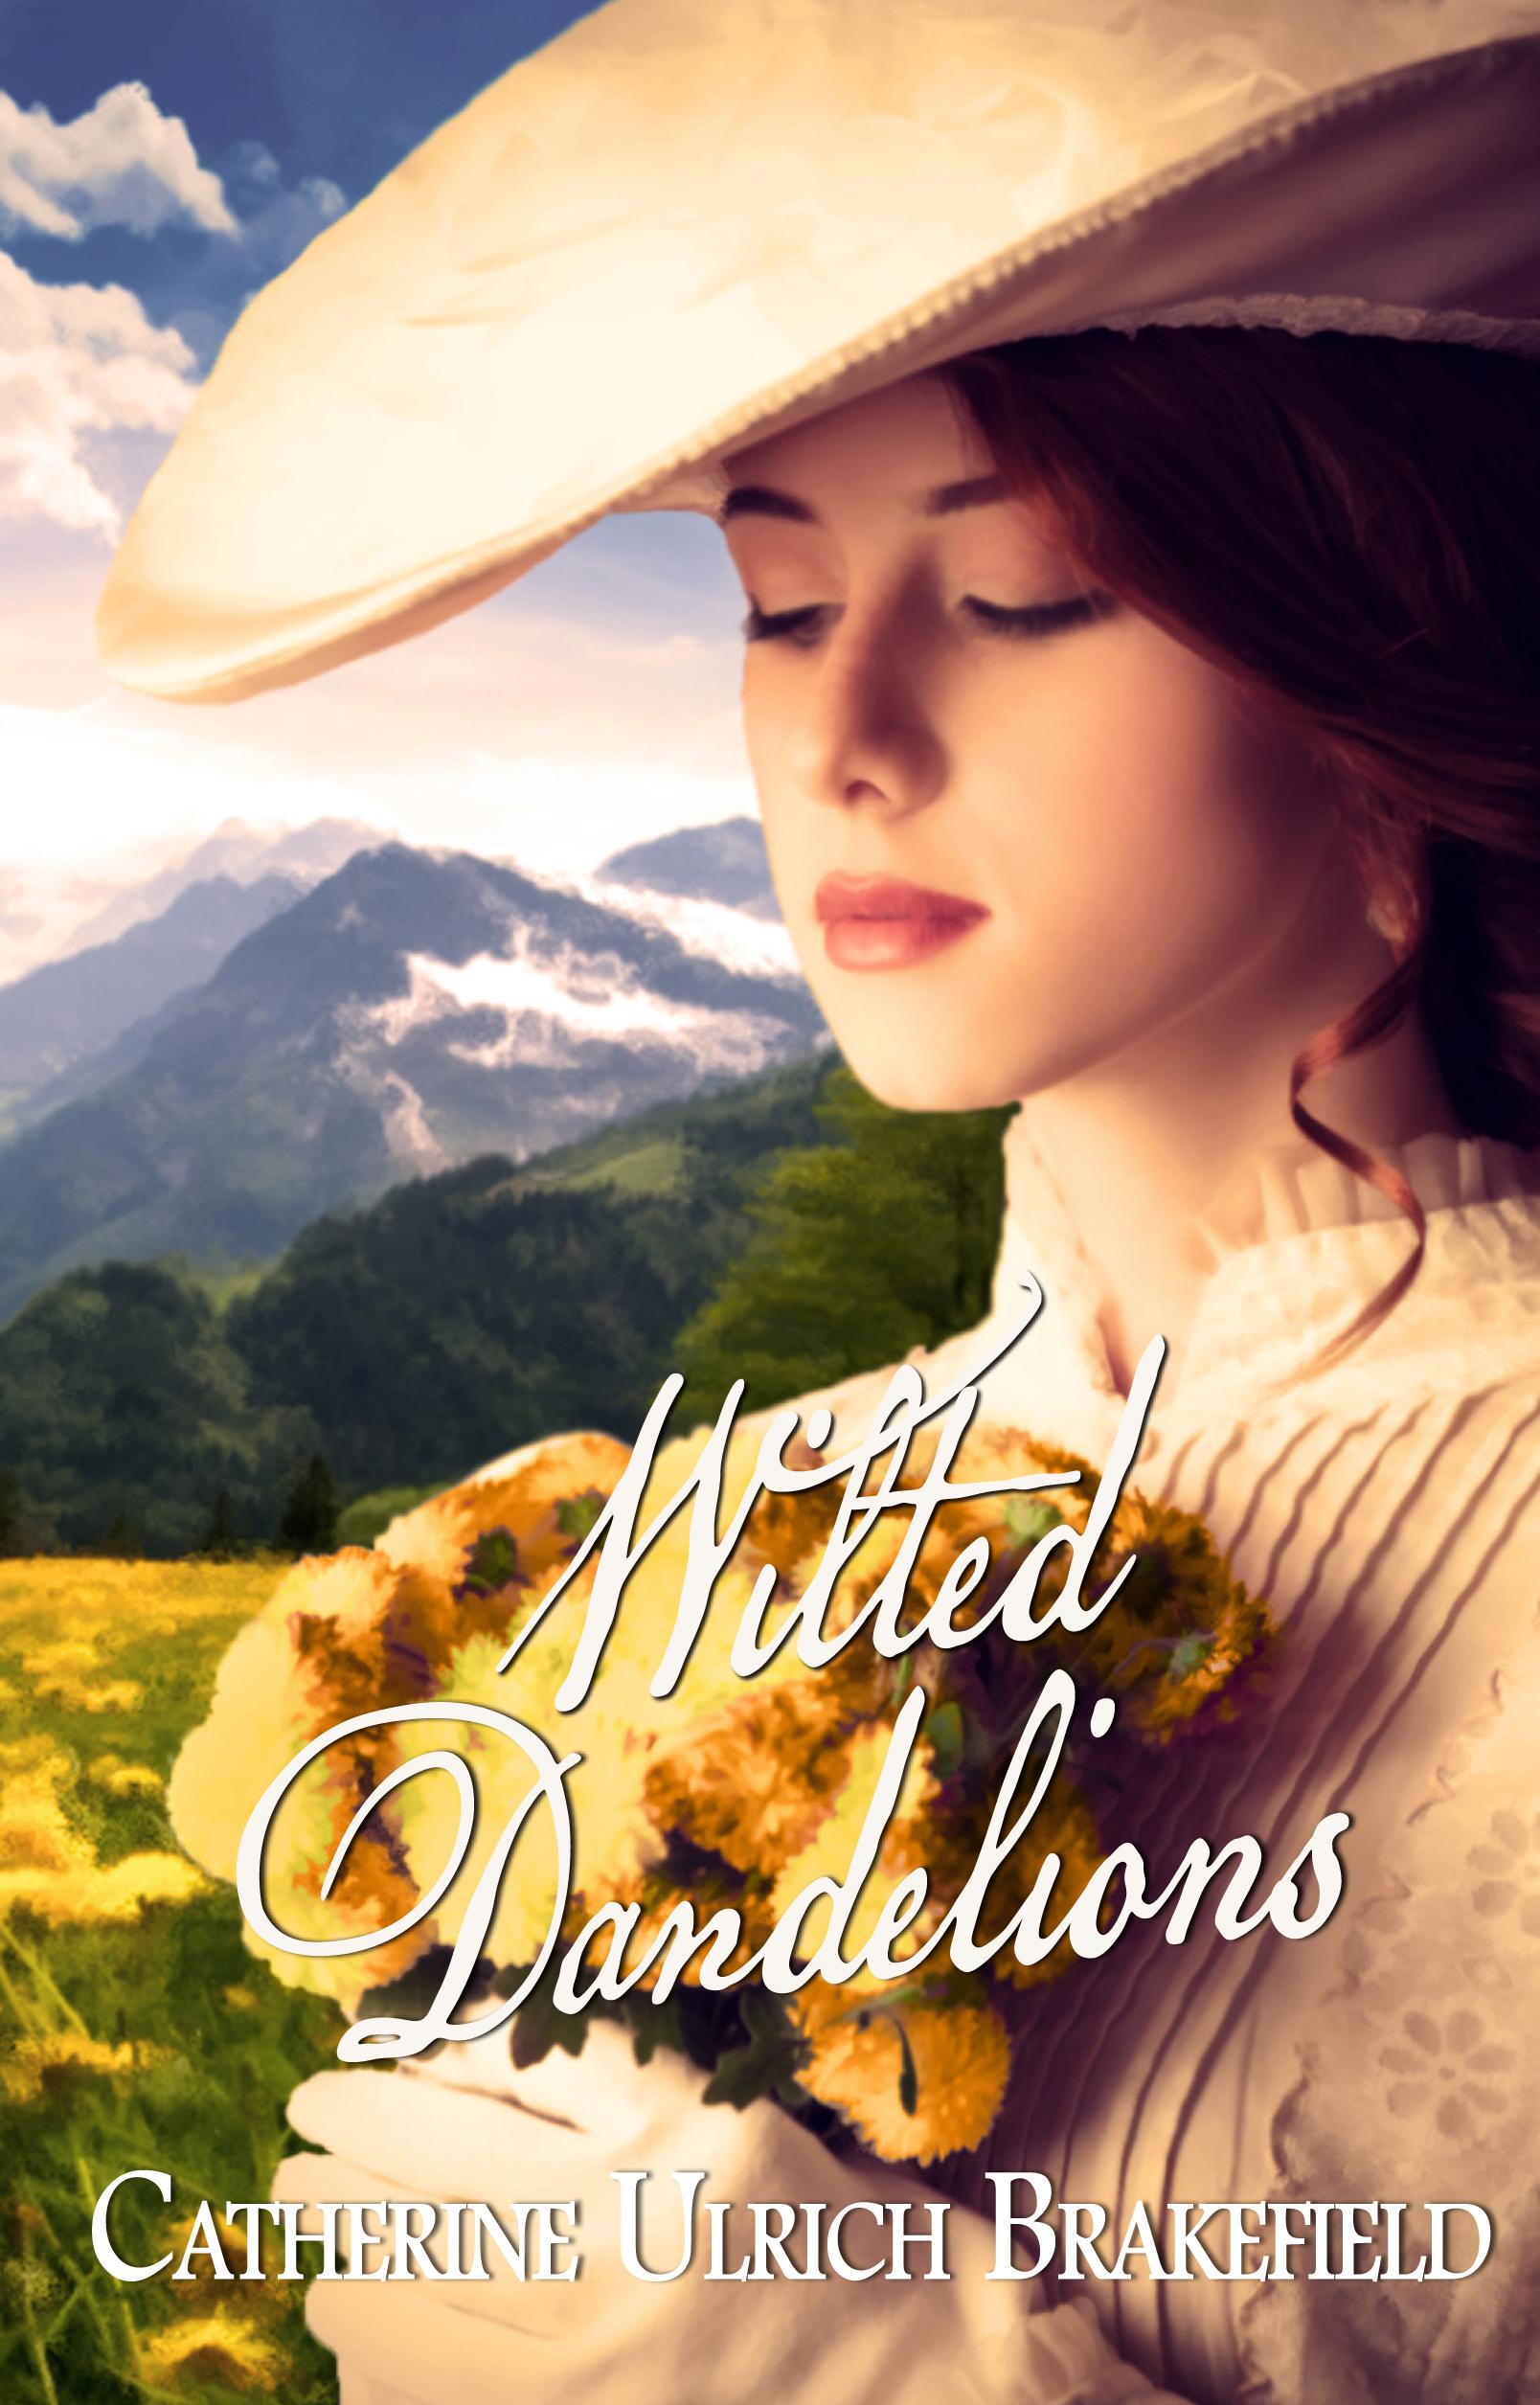 Wilted Dandelions Catherine Ulrich Brakefield